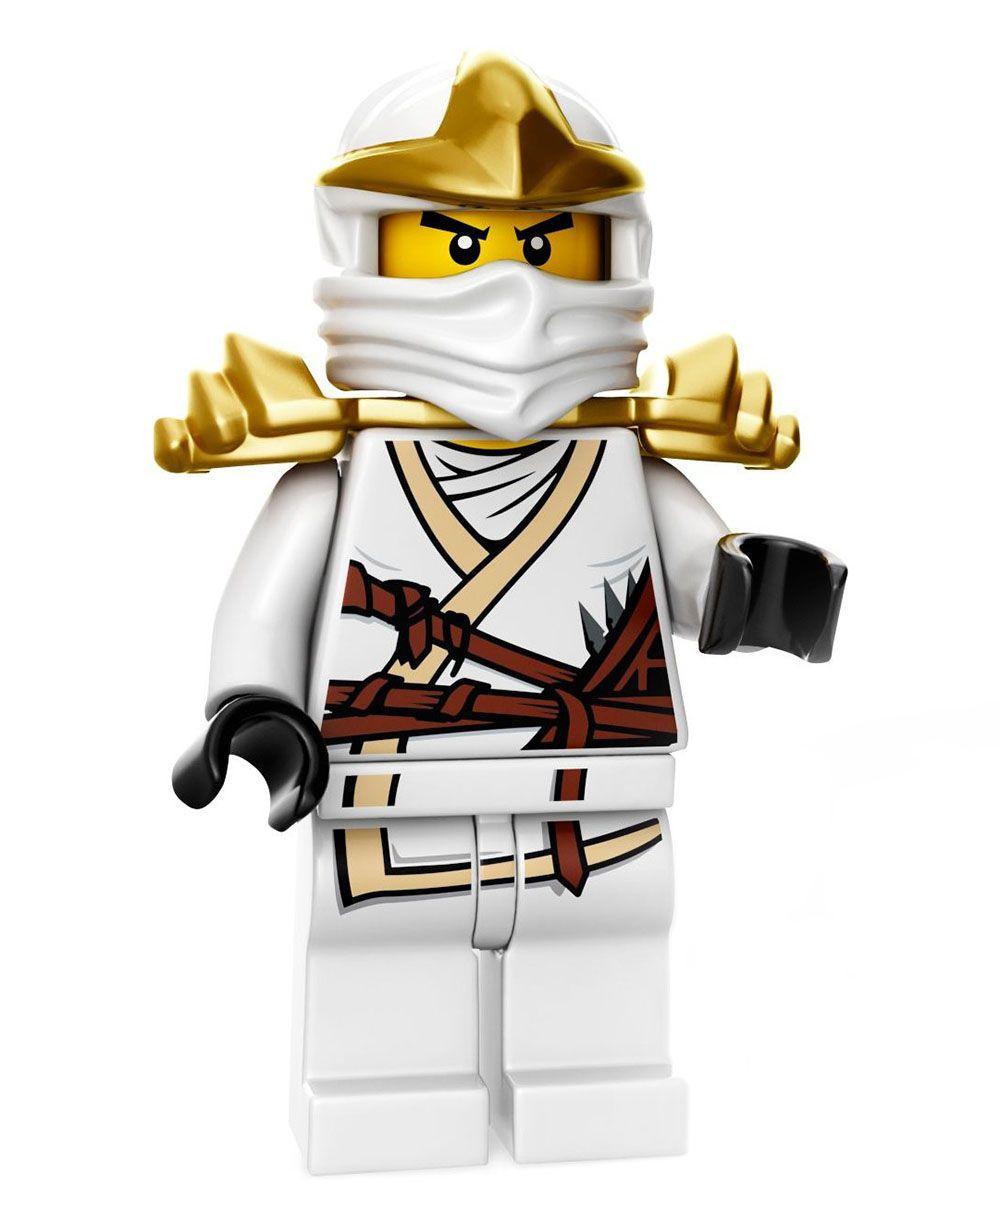 Lego ninjago 9554 pas cher zane zx - Personnage ninjago lego ...